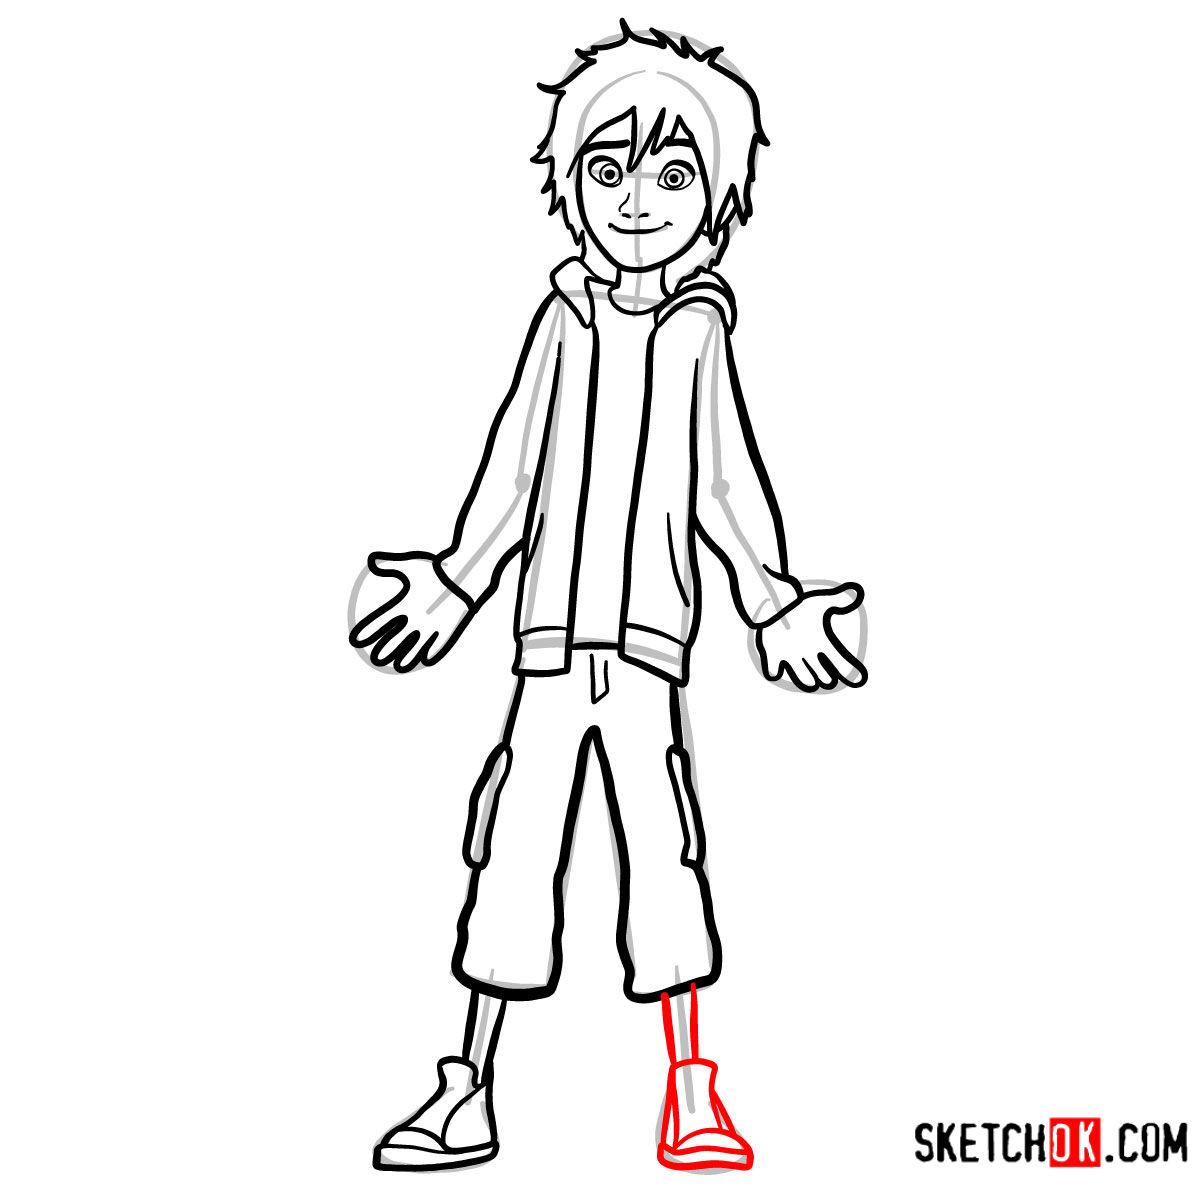 How to draw Hiro Hamada | Big Hero 6 - step 10